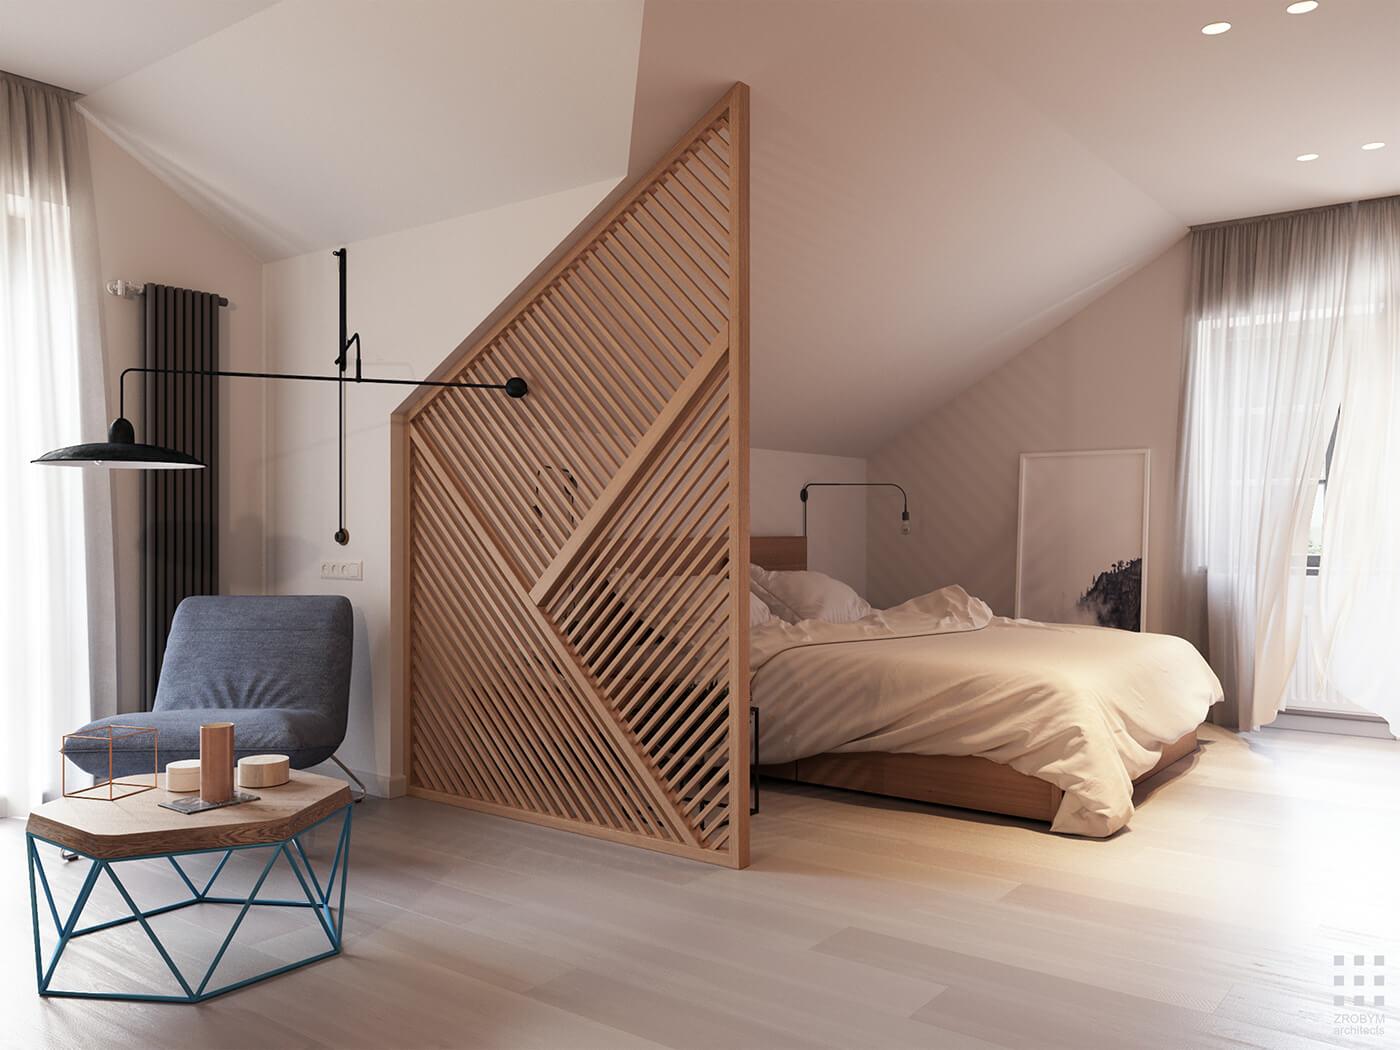 Free Interior Decorating Ideas Interior Design And Decoration,Decorating Country Homes